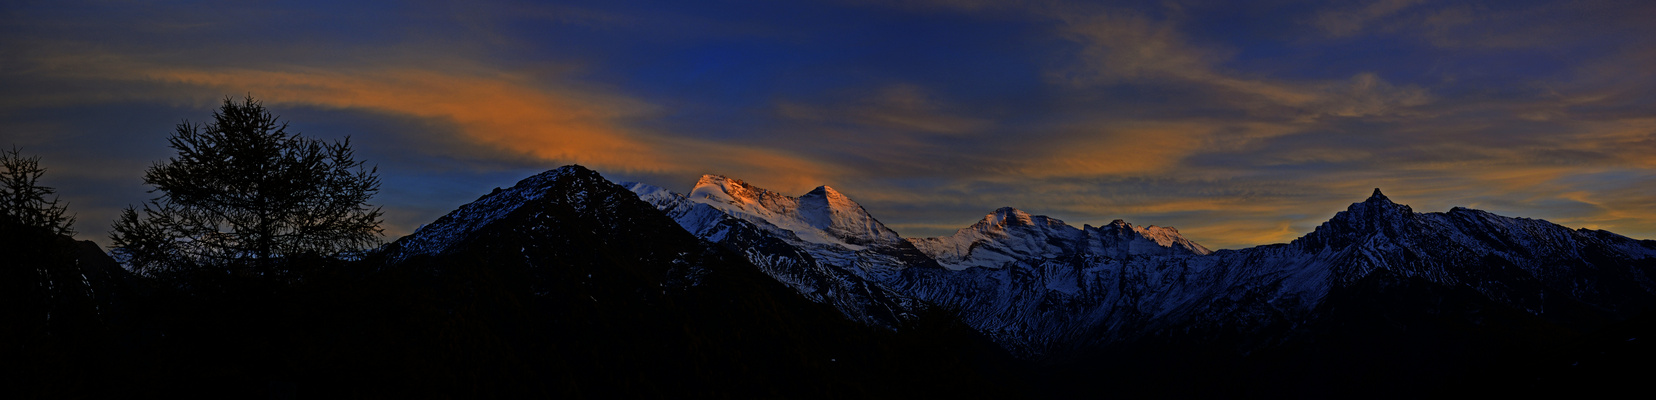 Nacht am Berg